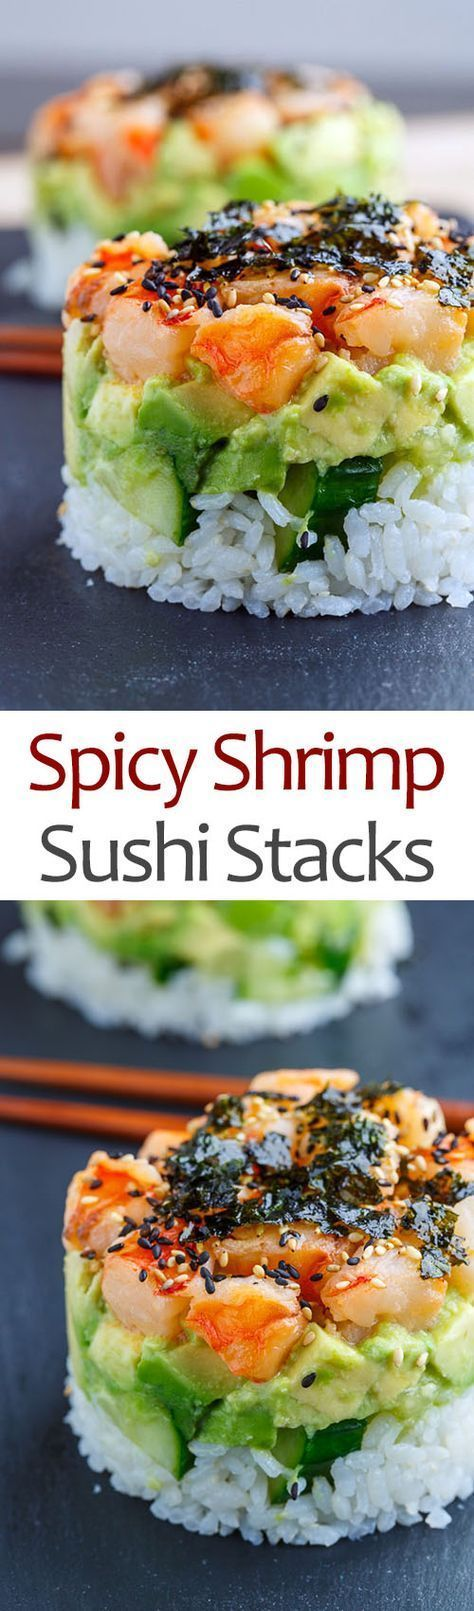 Photo of Spicy Shrimp Sushi Stacks Recipe